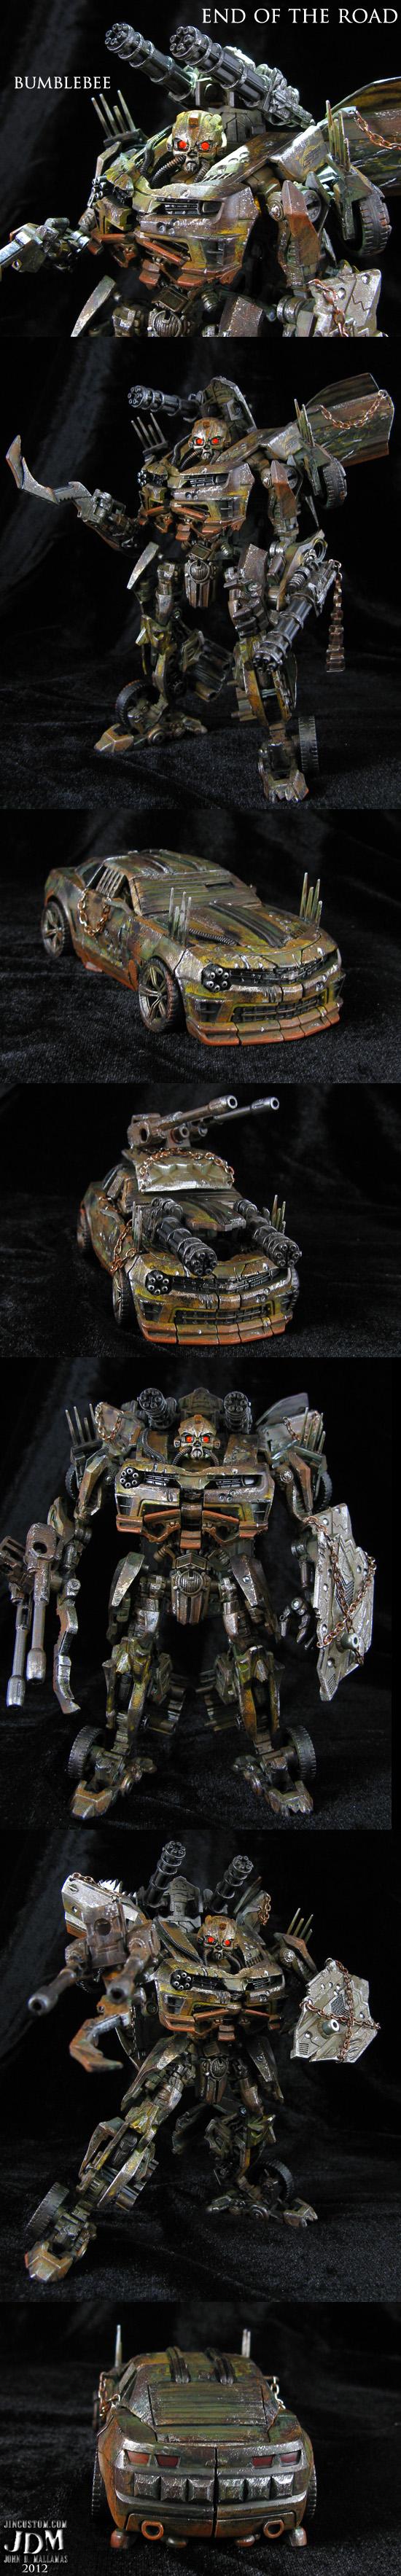 Custom Transformers figure